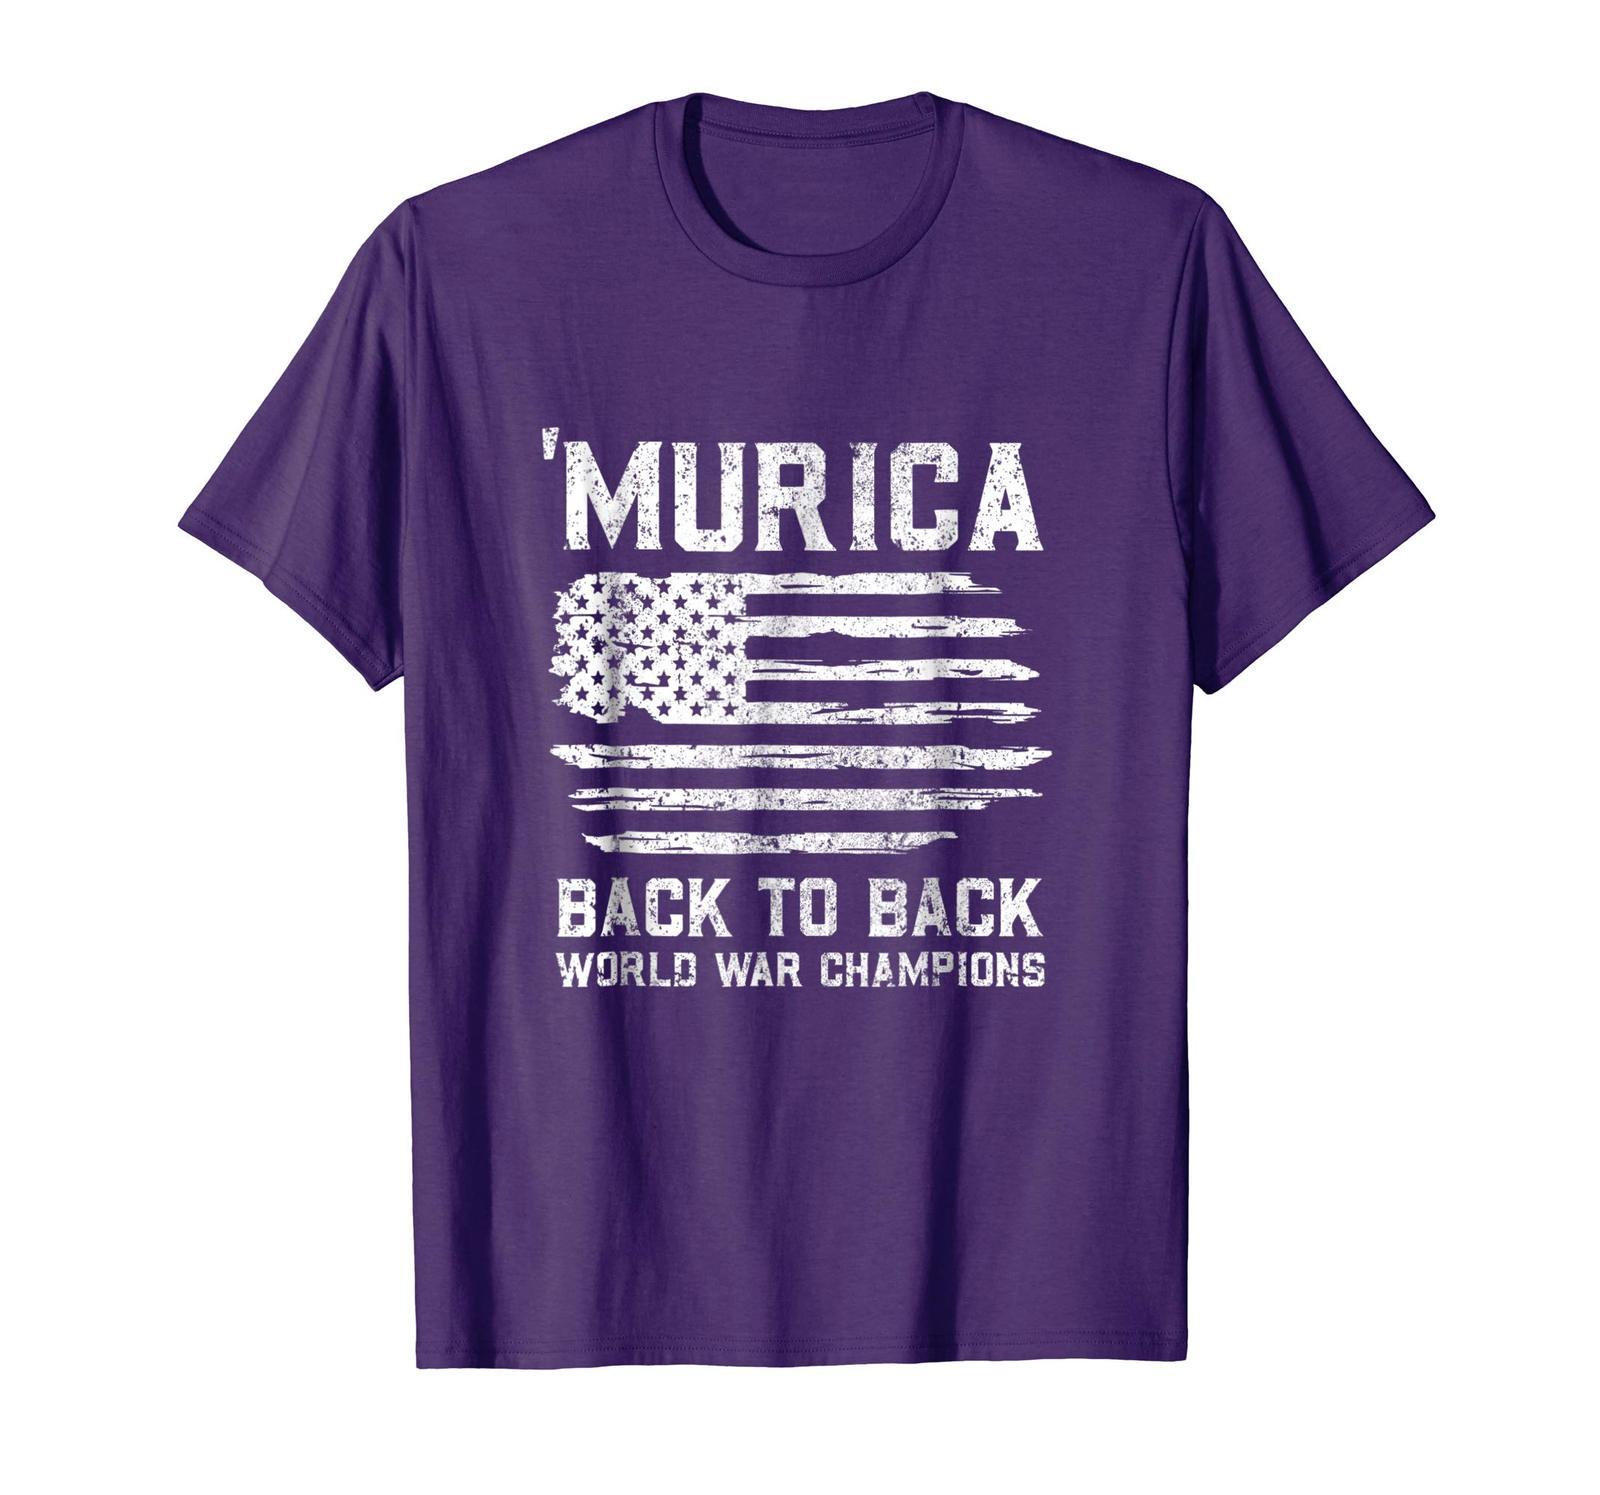 Dad Shirts - Murica Back To Back World War Champions Champs Shirt 4 July Men